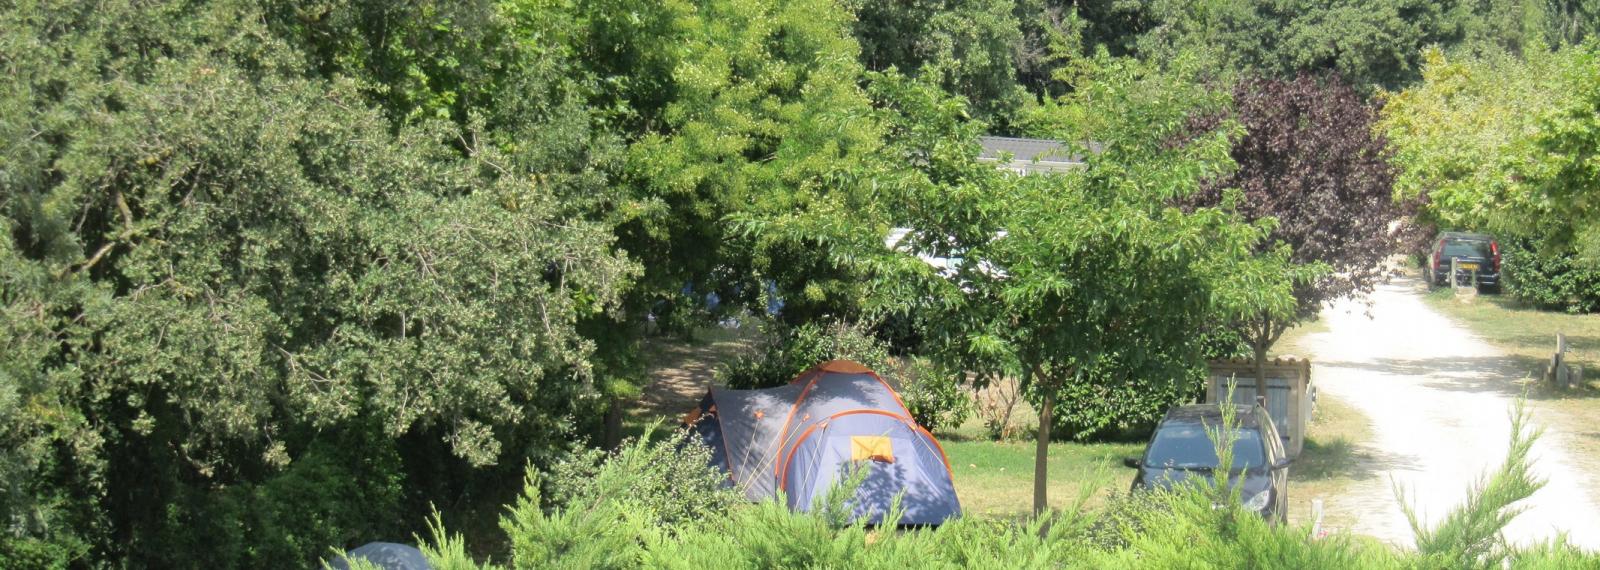 Camping du Vieux Chemin d'Arles